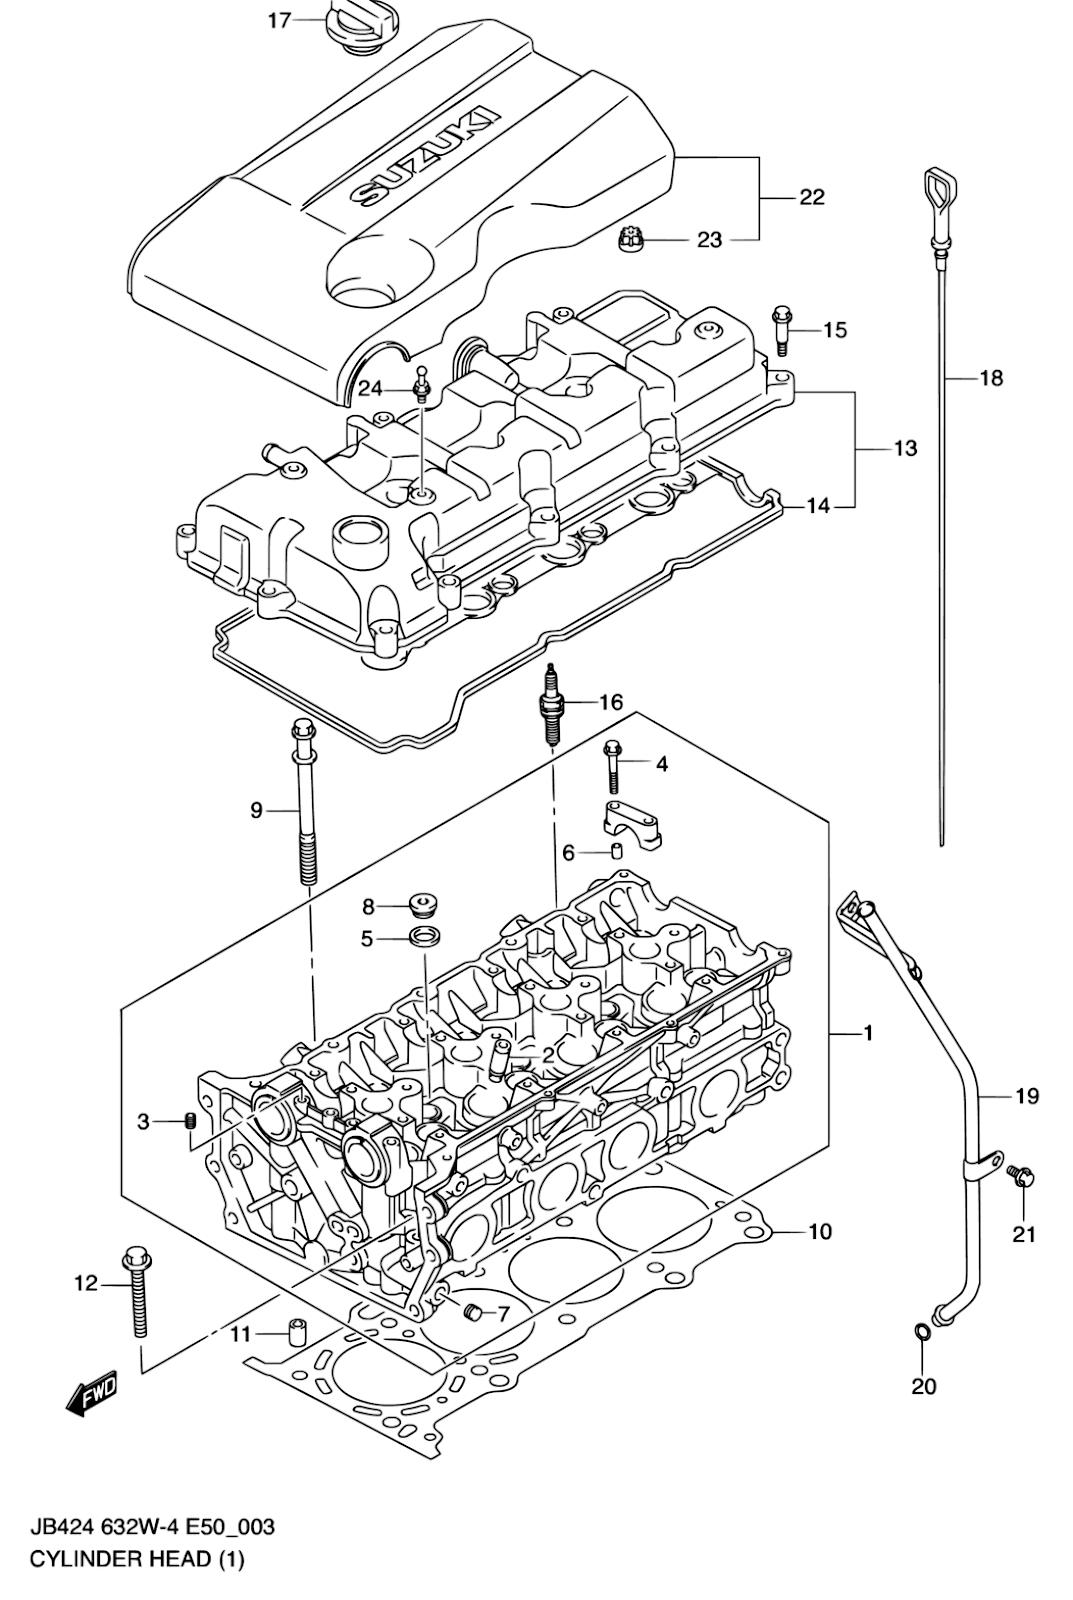 2003 Suzuki Aerio Fuse Diagram  We Have A 2003 Suzuki